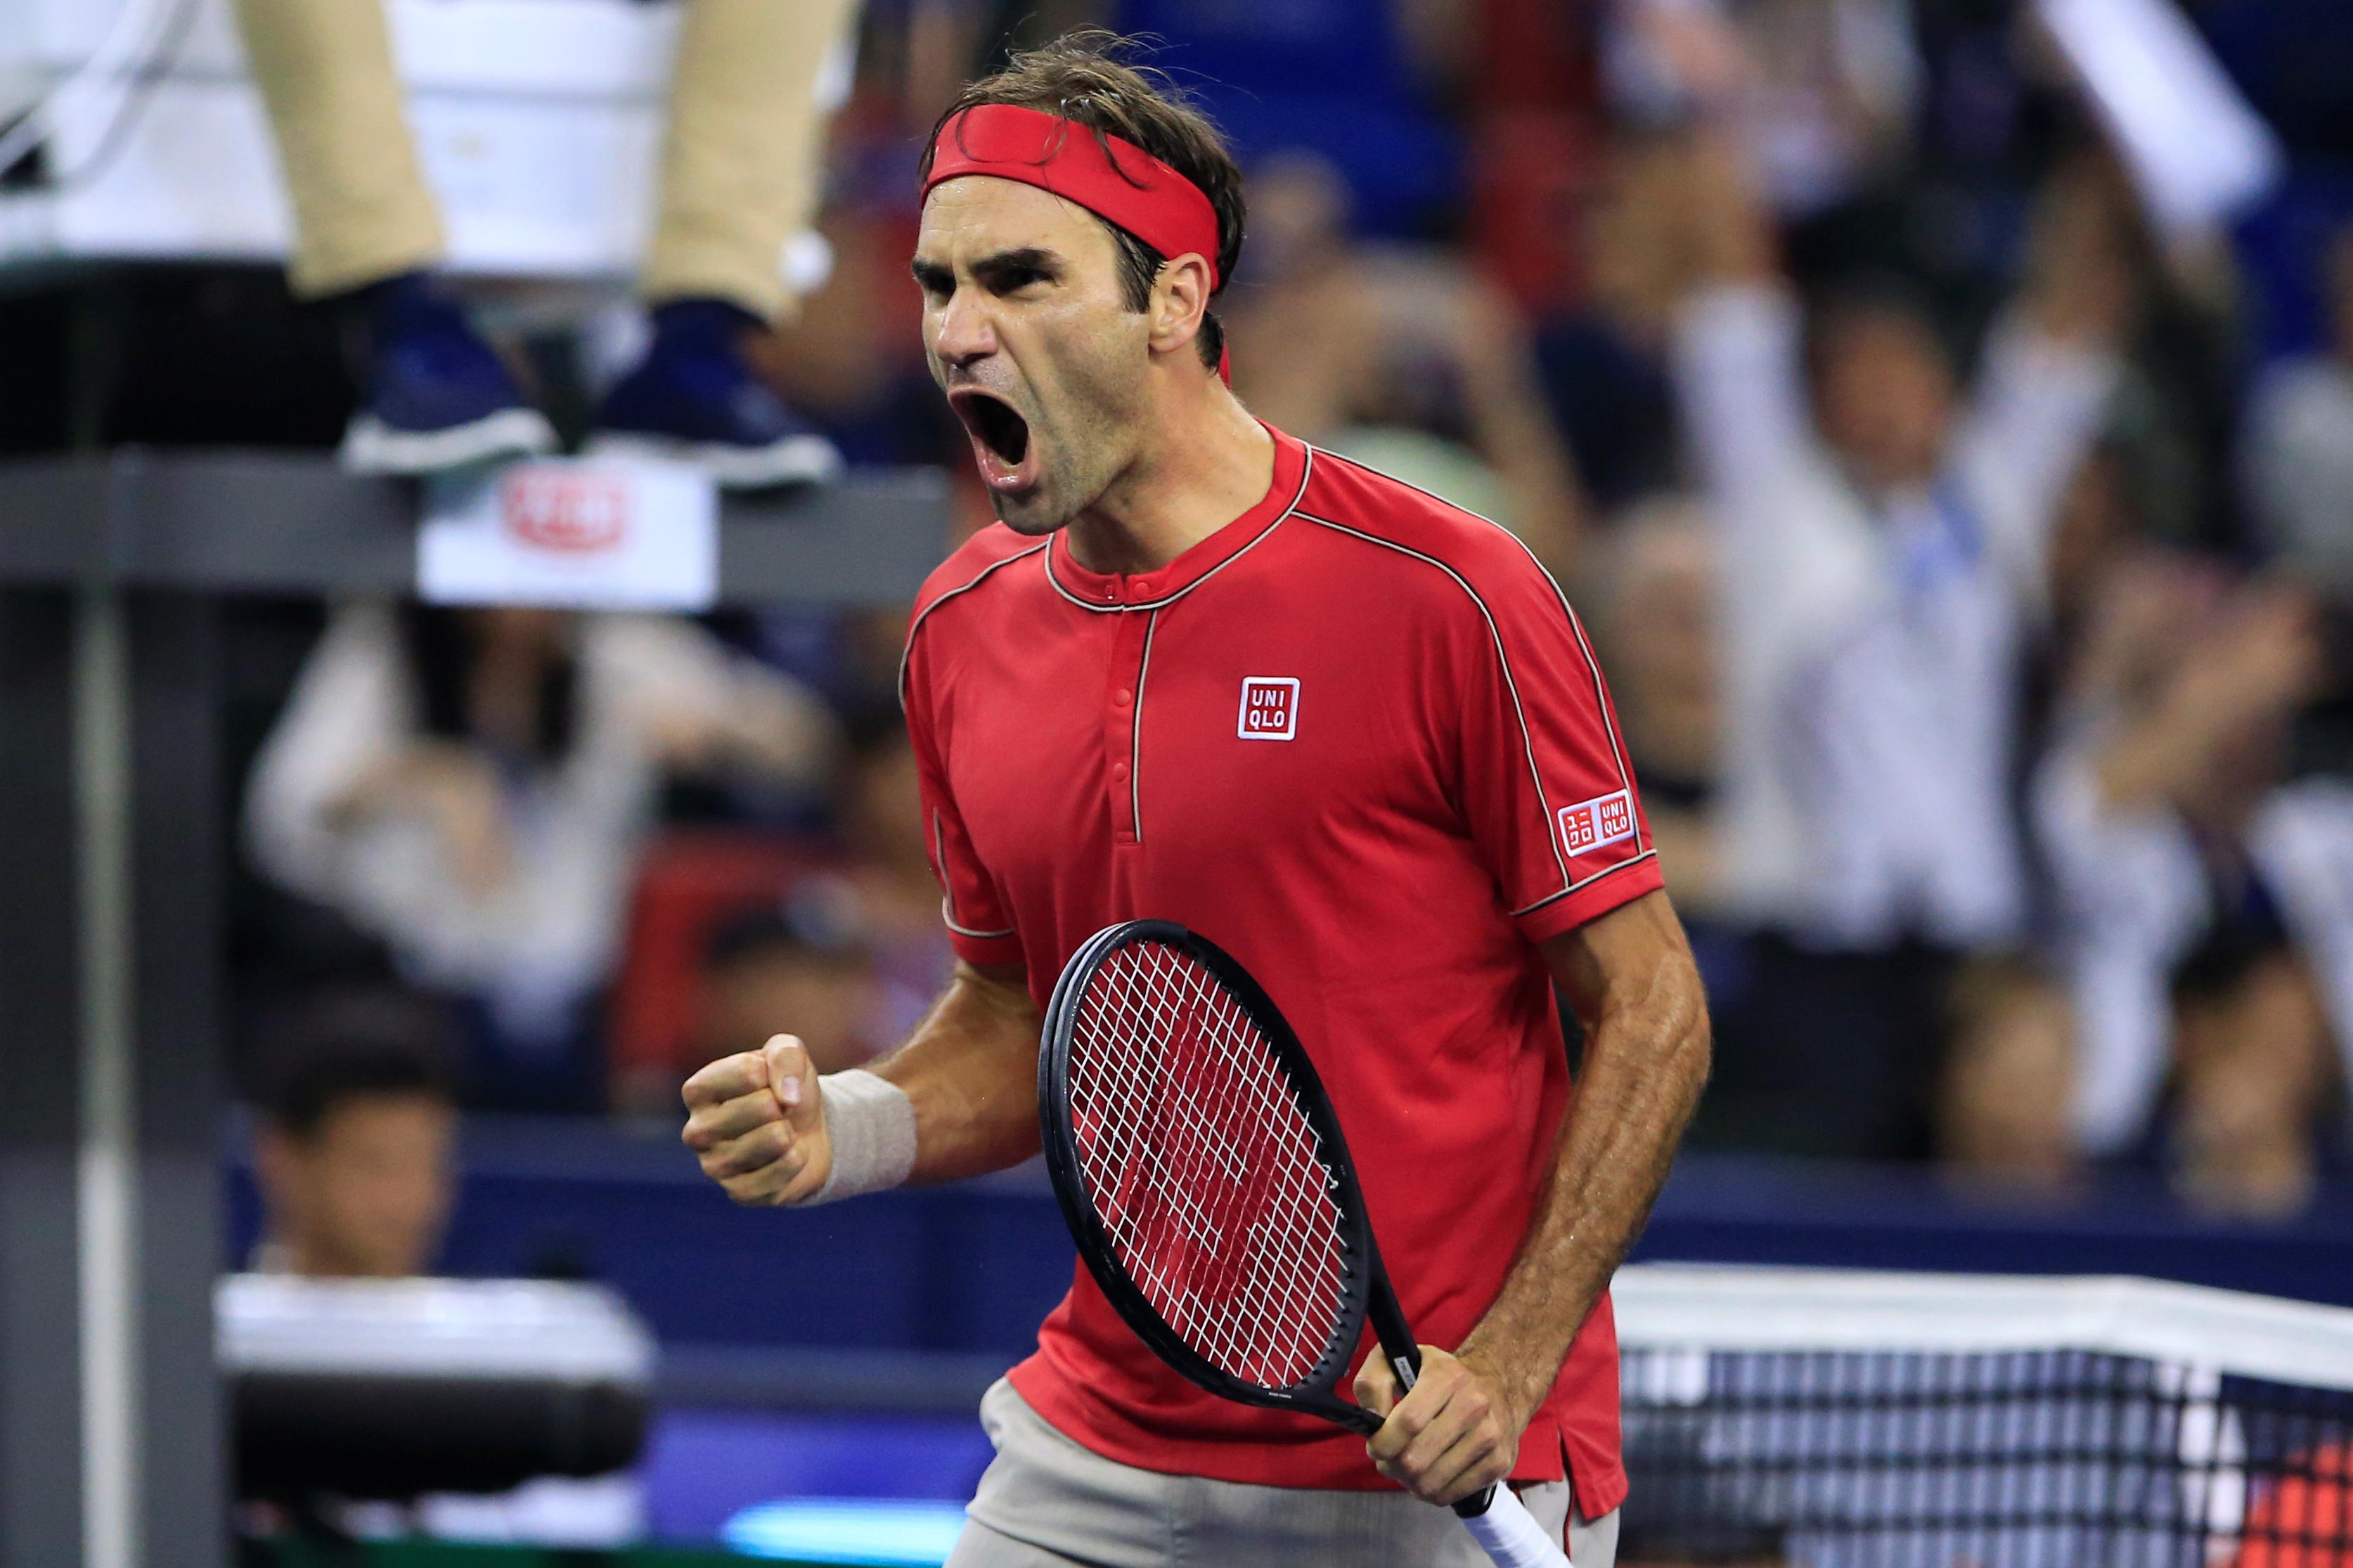 Tennis: Ruthless Federer obliterates Albot to reach Basel quarter-finals